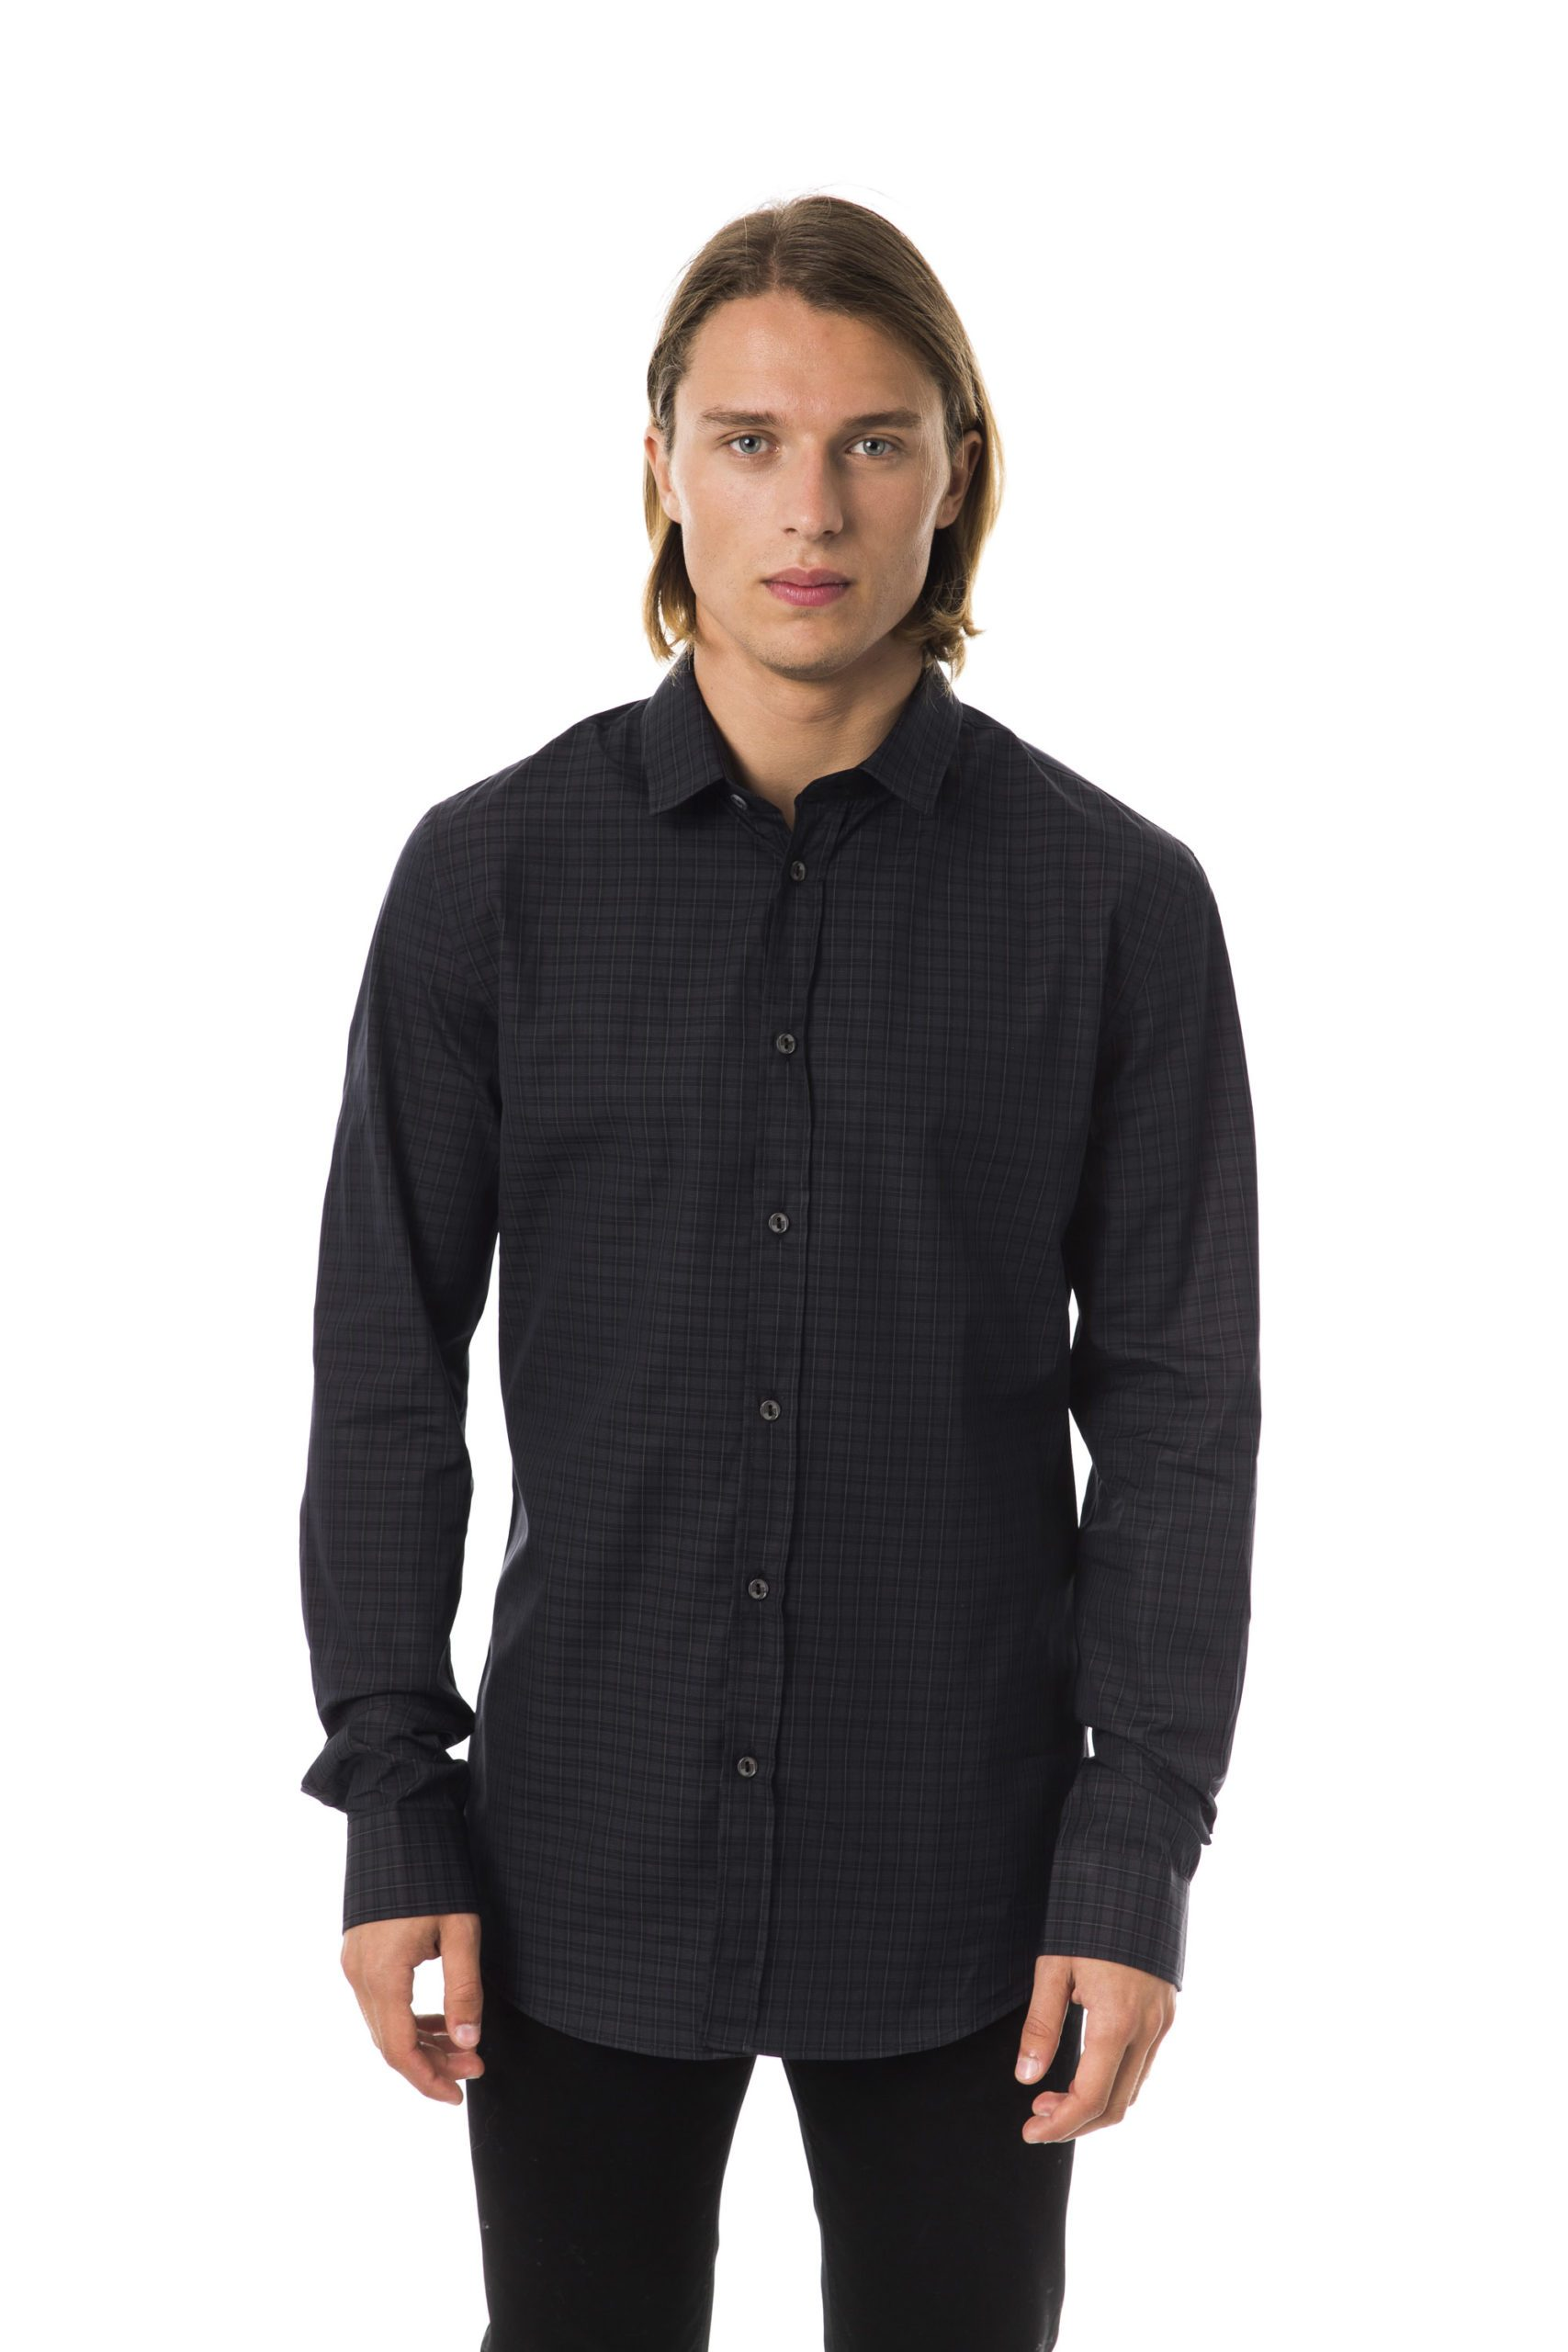 BYBLOS Men's Nero Shirt Black BY1394852 - XS